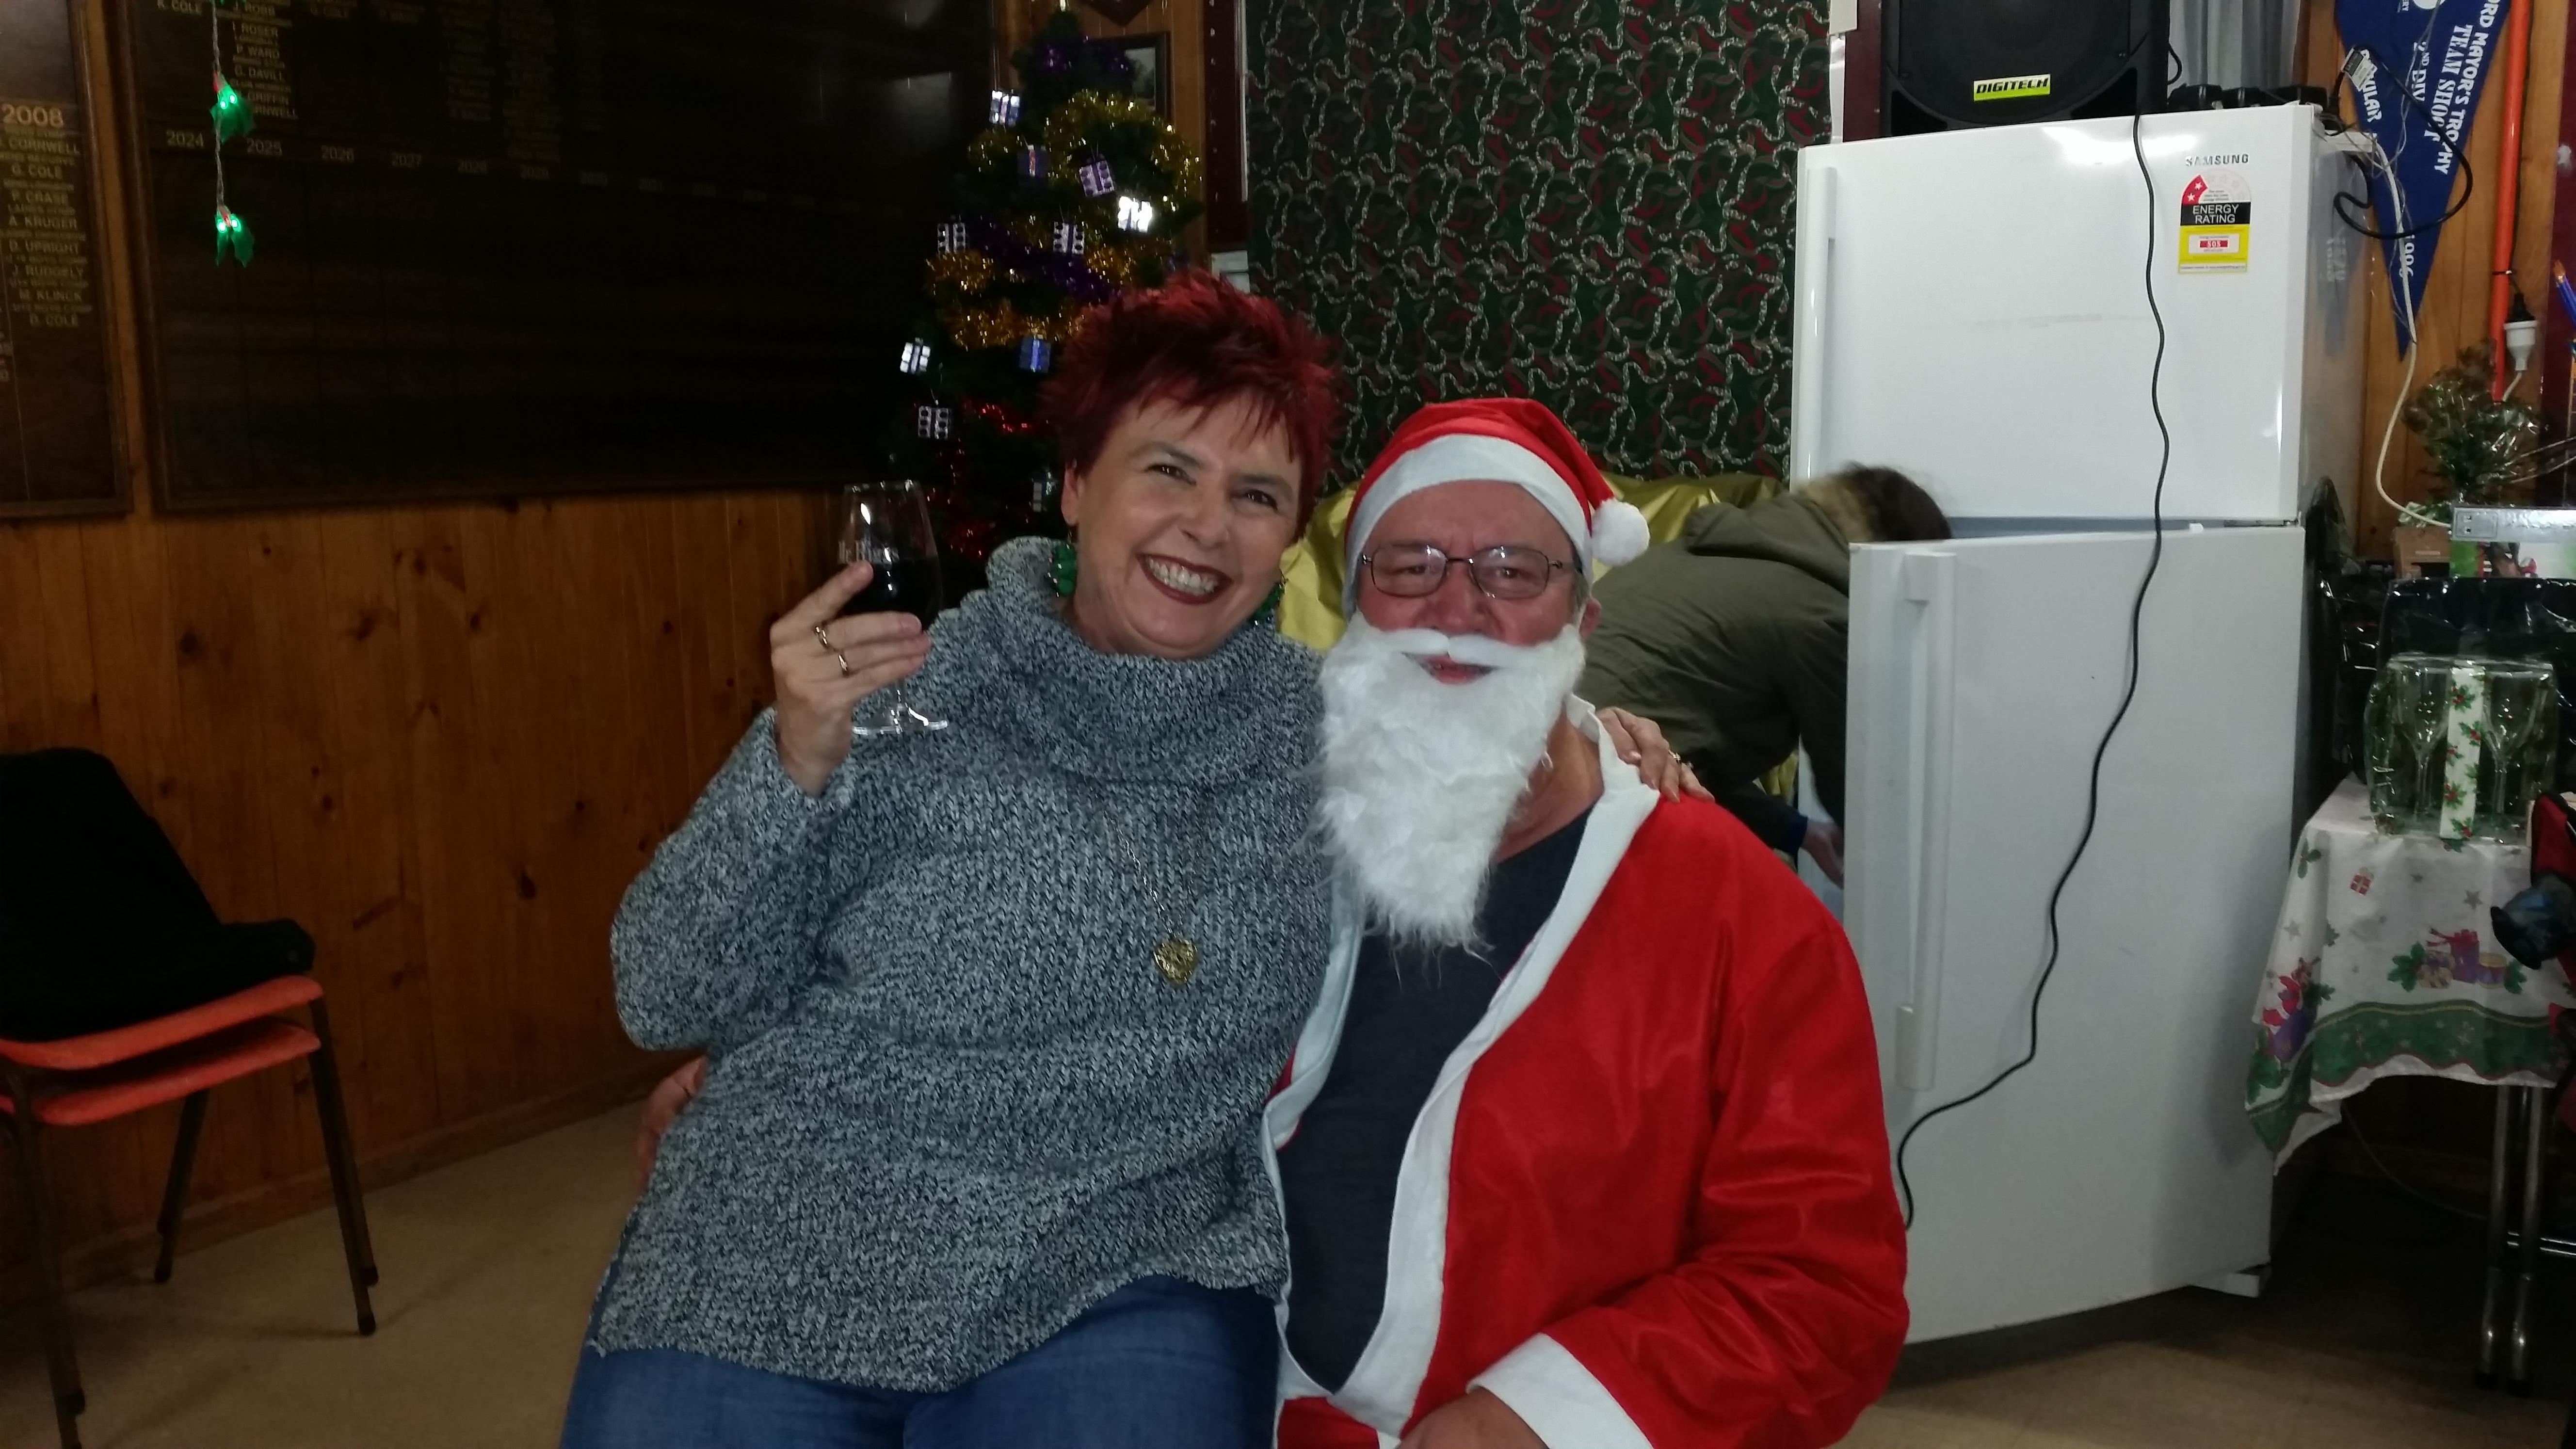 Trish and Santa